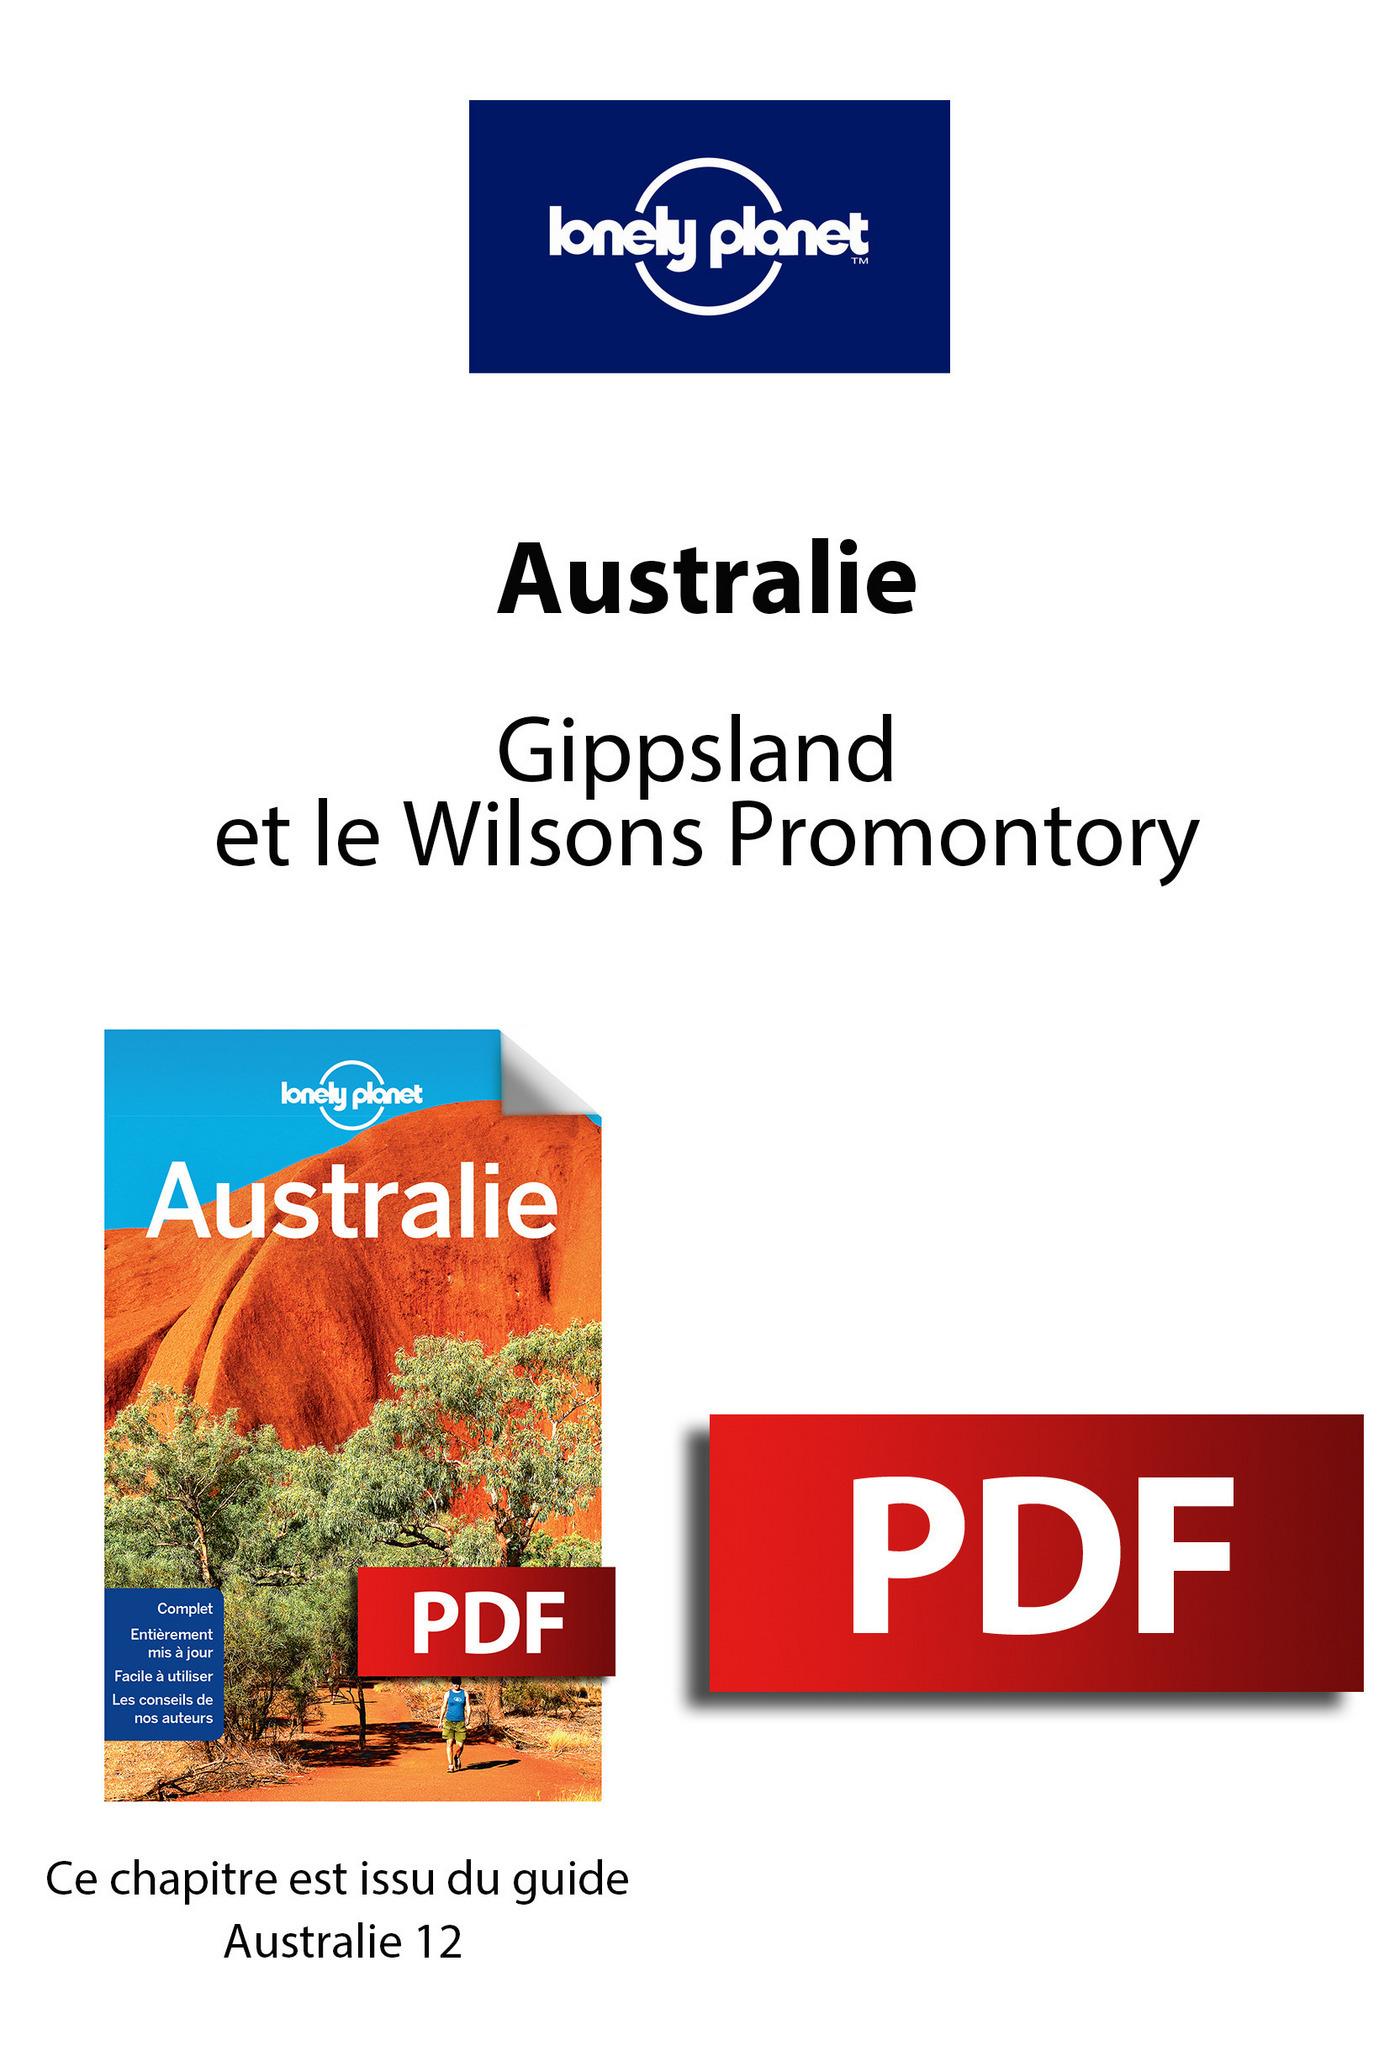 Australie - Gippsland et le Wilsons Promontory